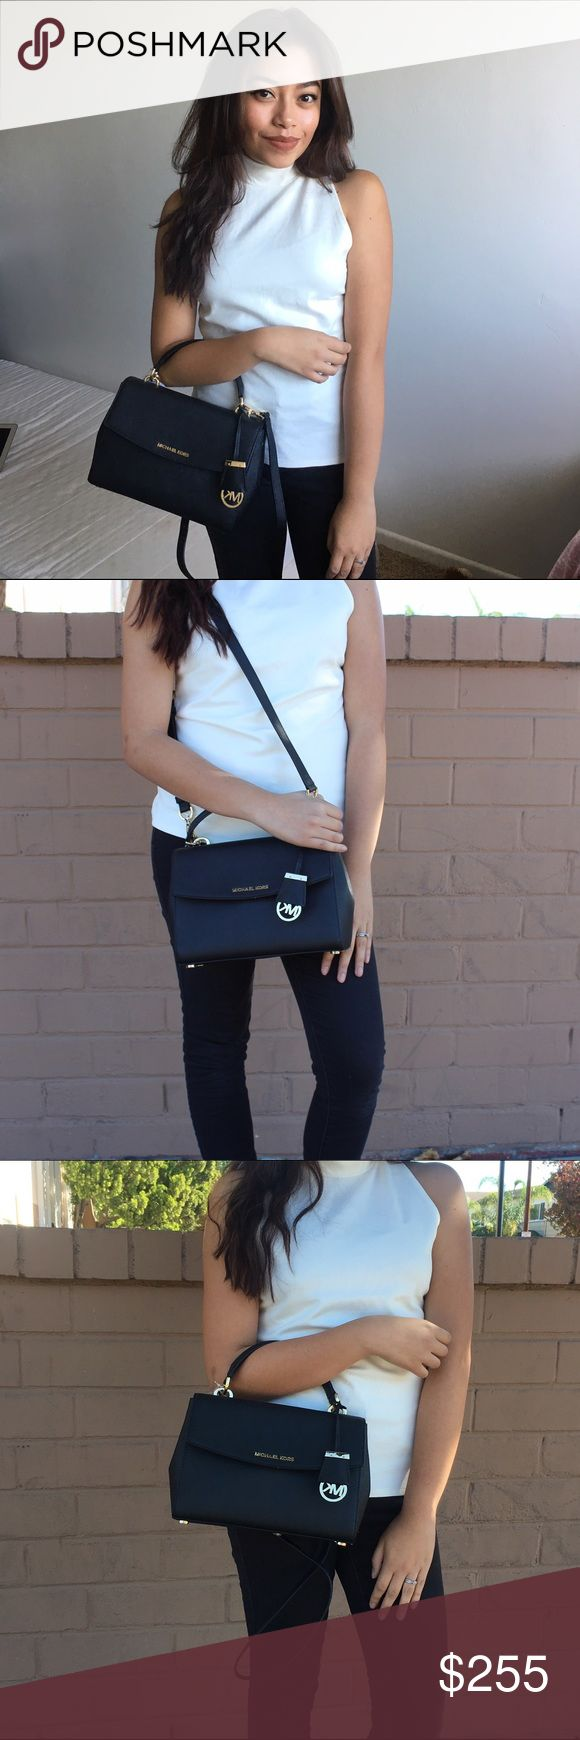 Michael Kors Ava purse NWT authentic black Michael kors Ava purse! Has attachable straps as well! Michael Kors Bags